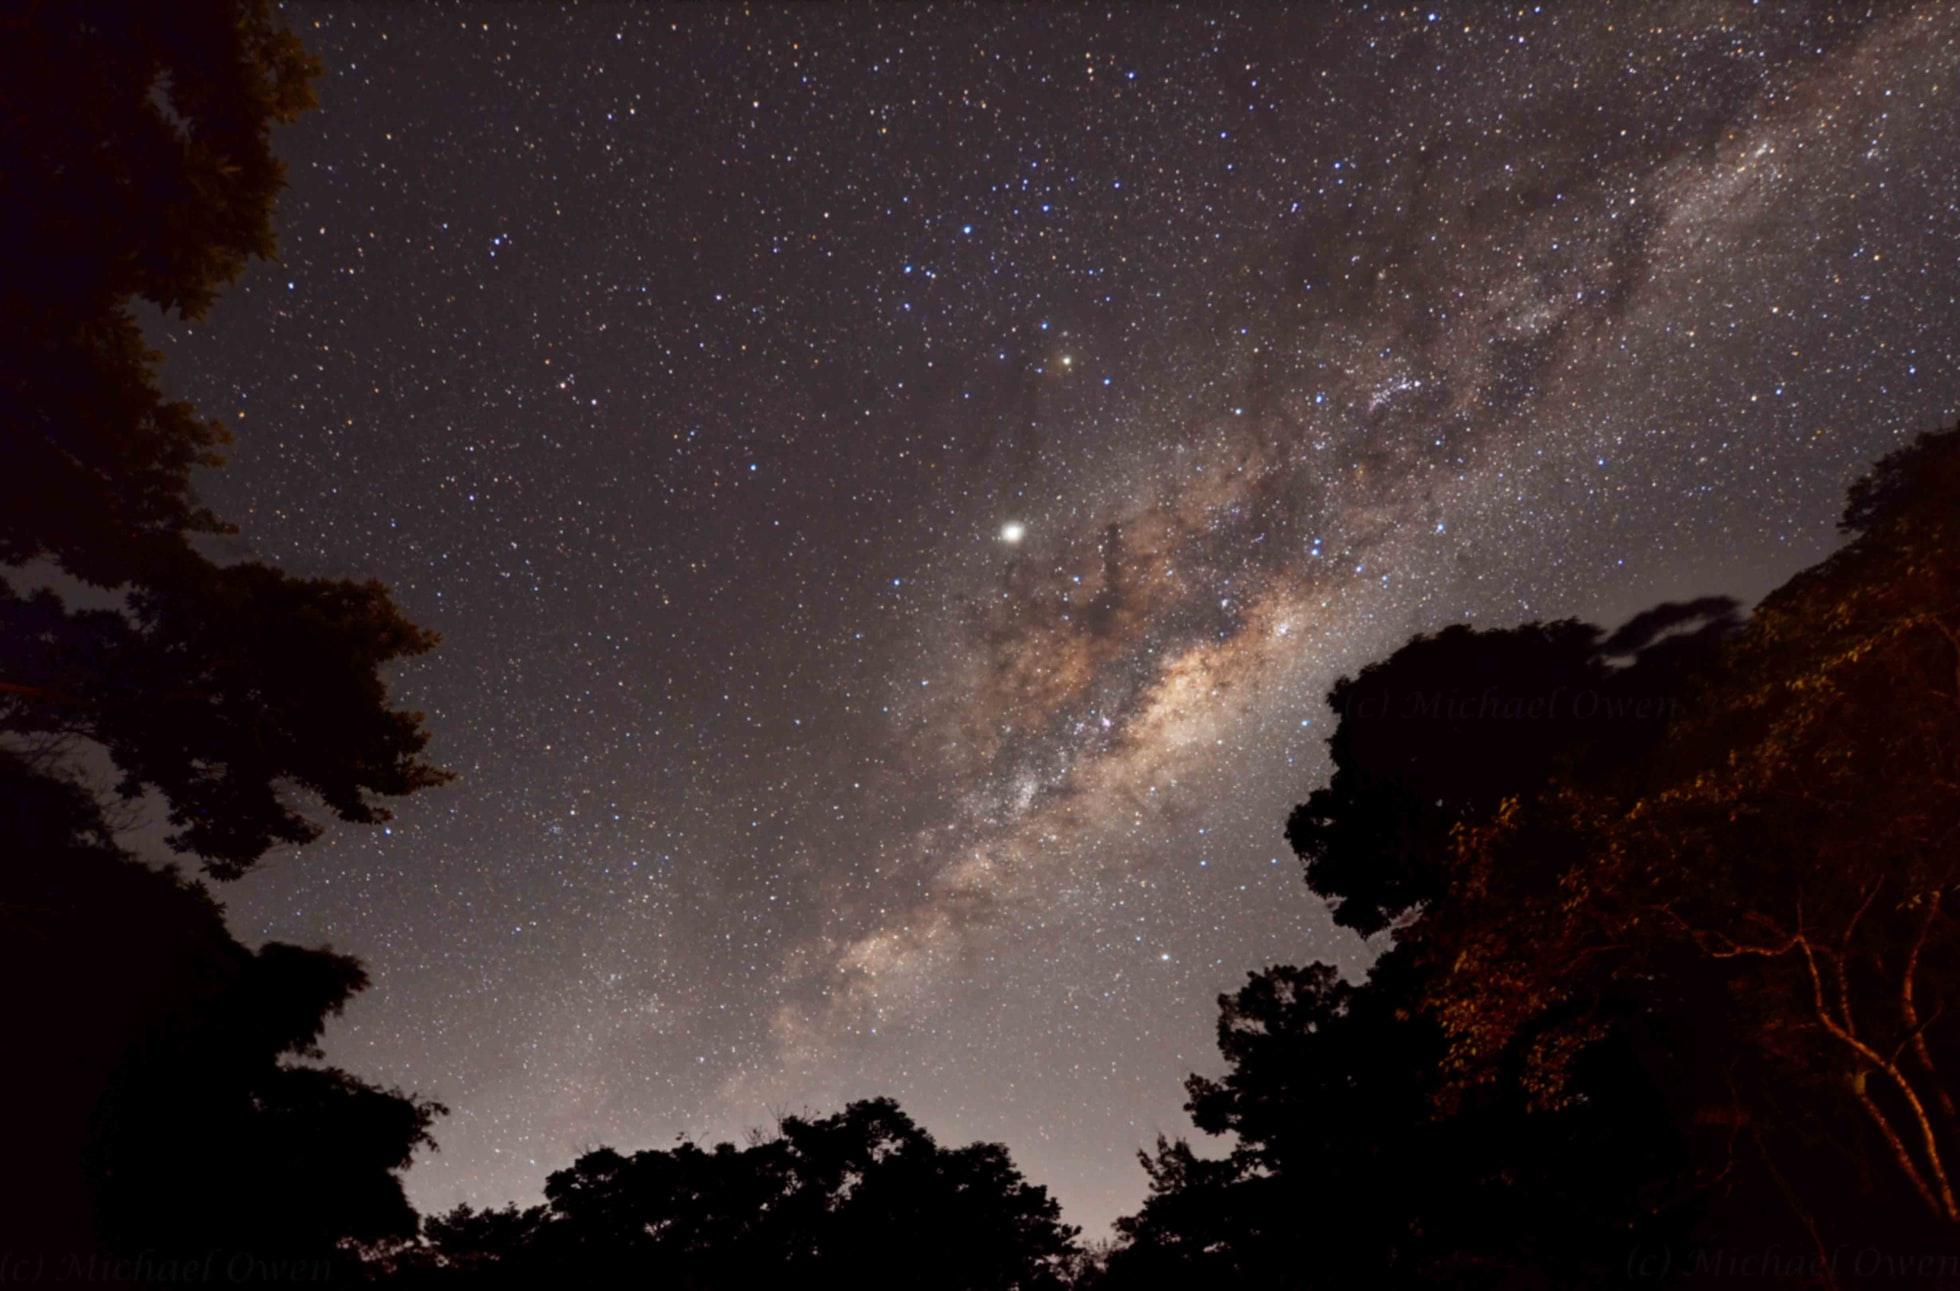 photo of the night sky with stars illuminated